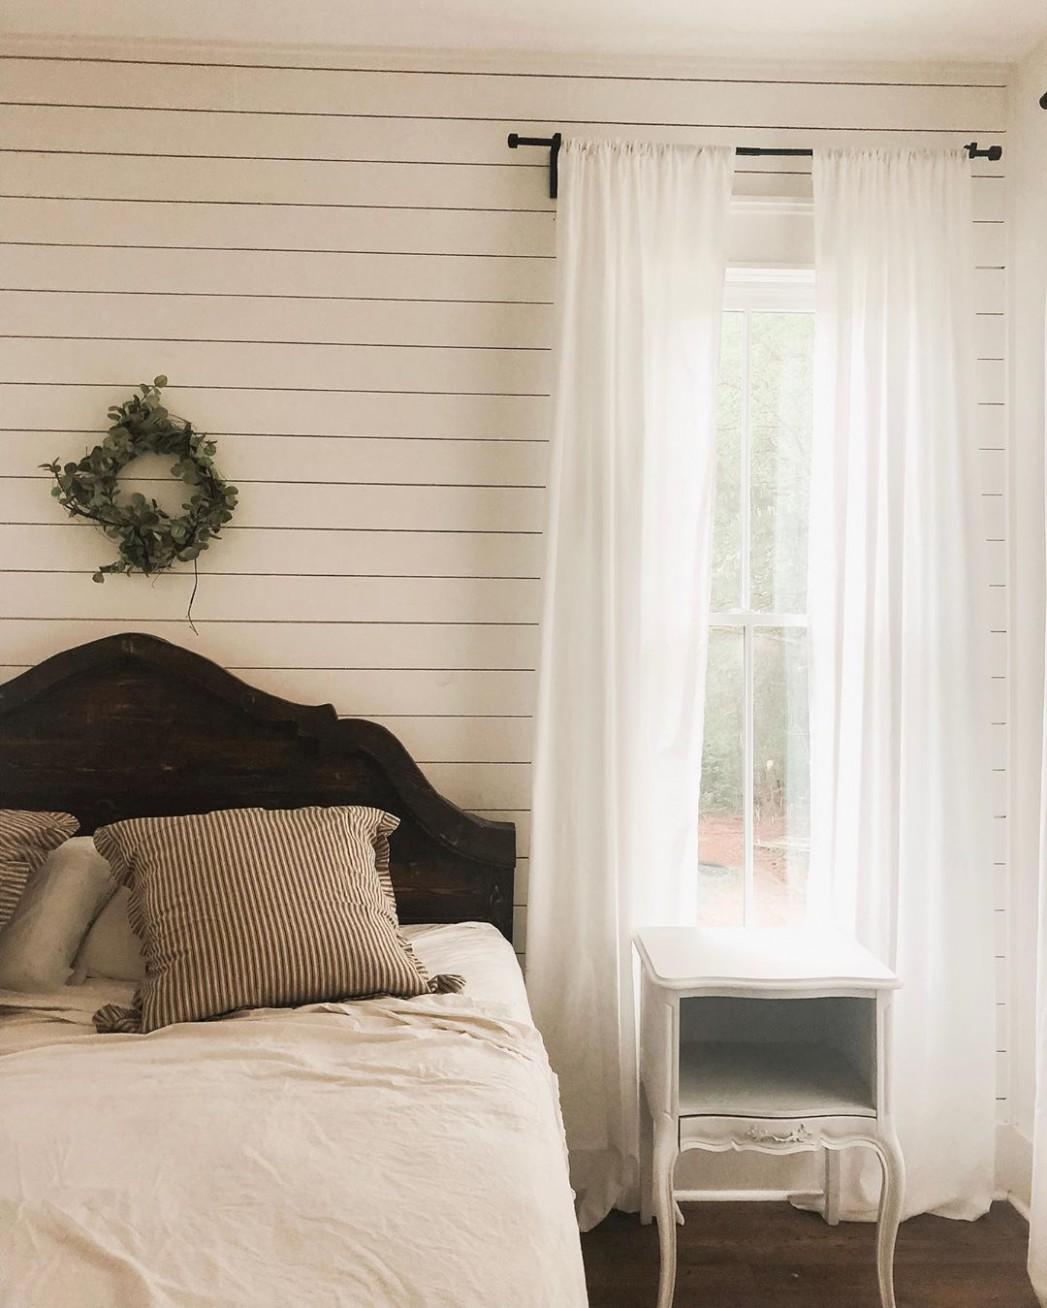 9 Best Bedroom Curtain Ideas - Easy Ideas for Bedroom Window  - Window Treatment Ideas For Bedroom